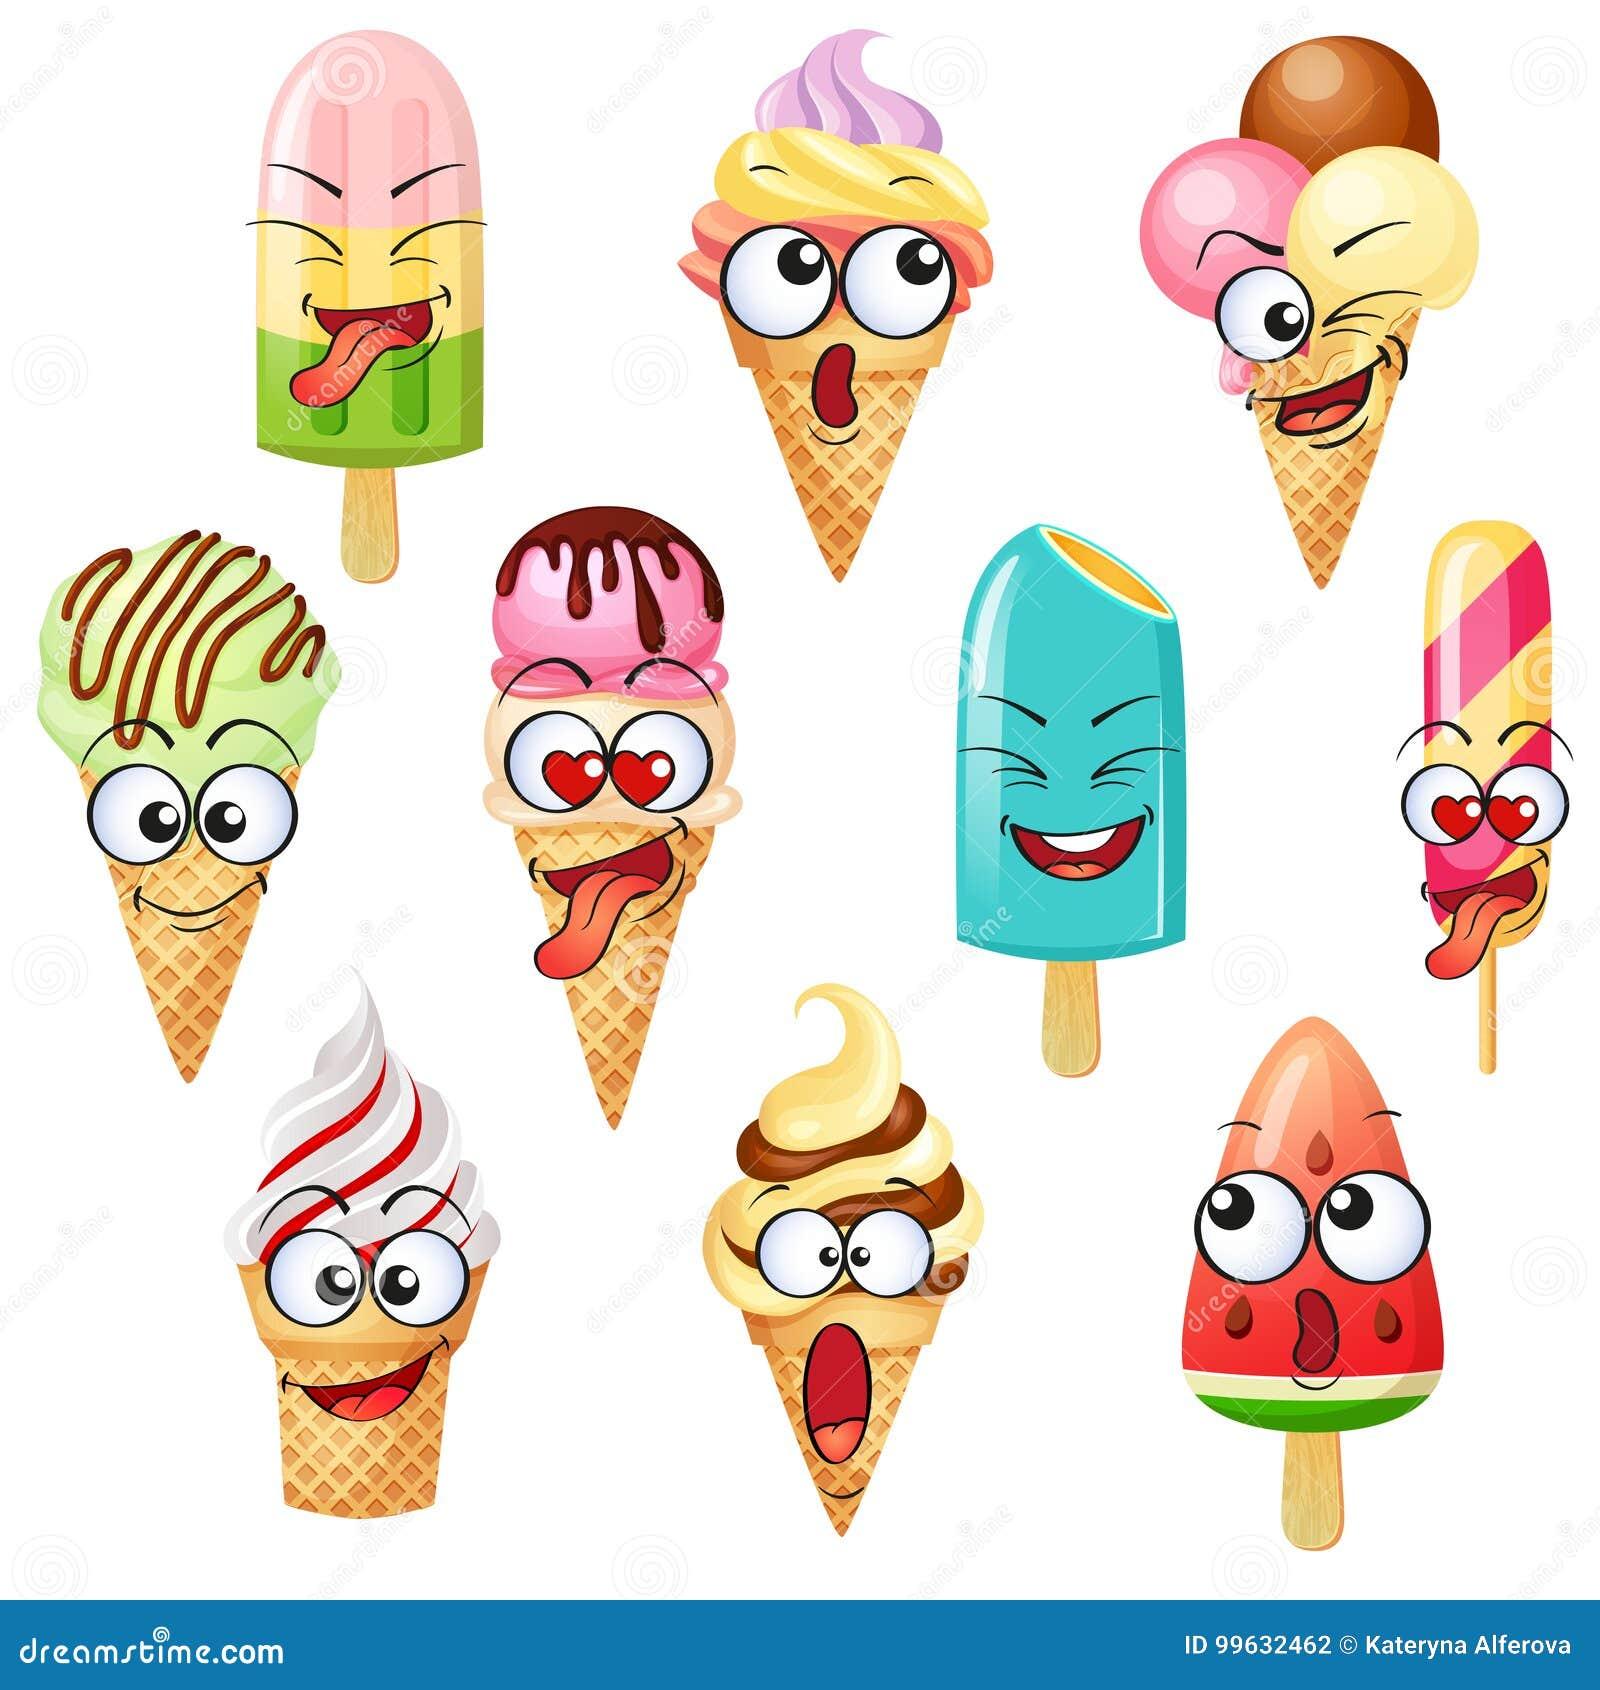 Kreskówka lody charaktery, emoticons